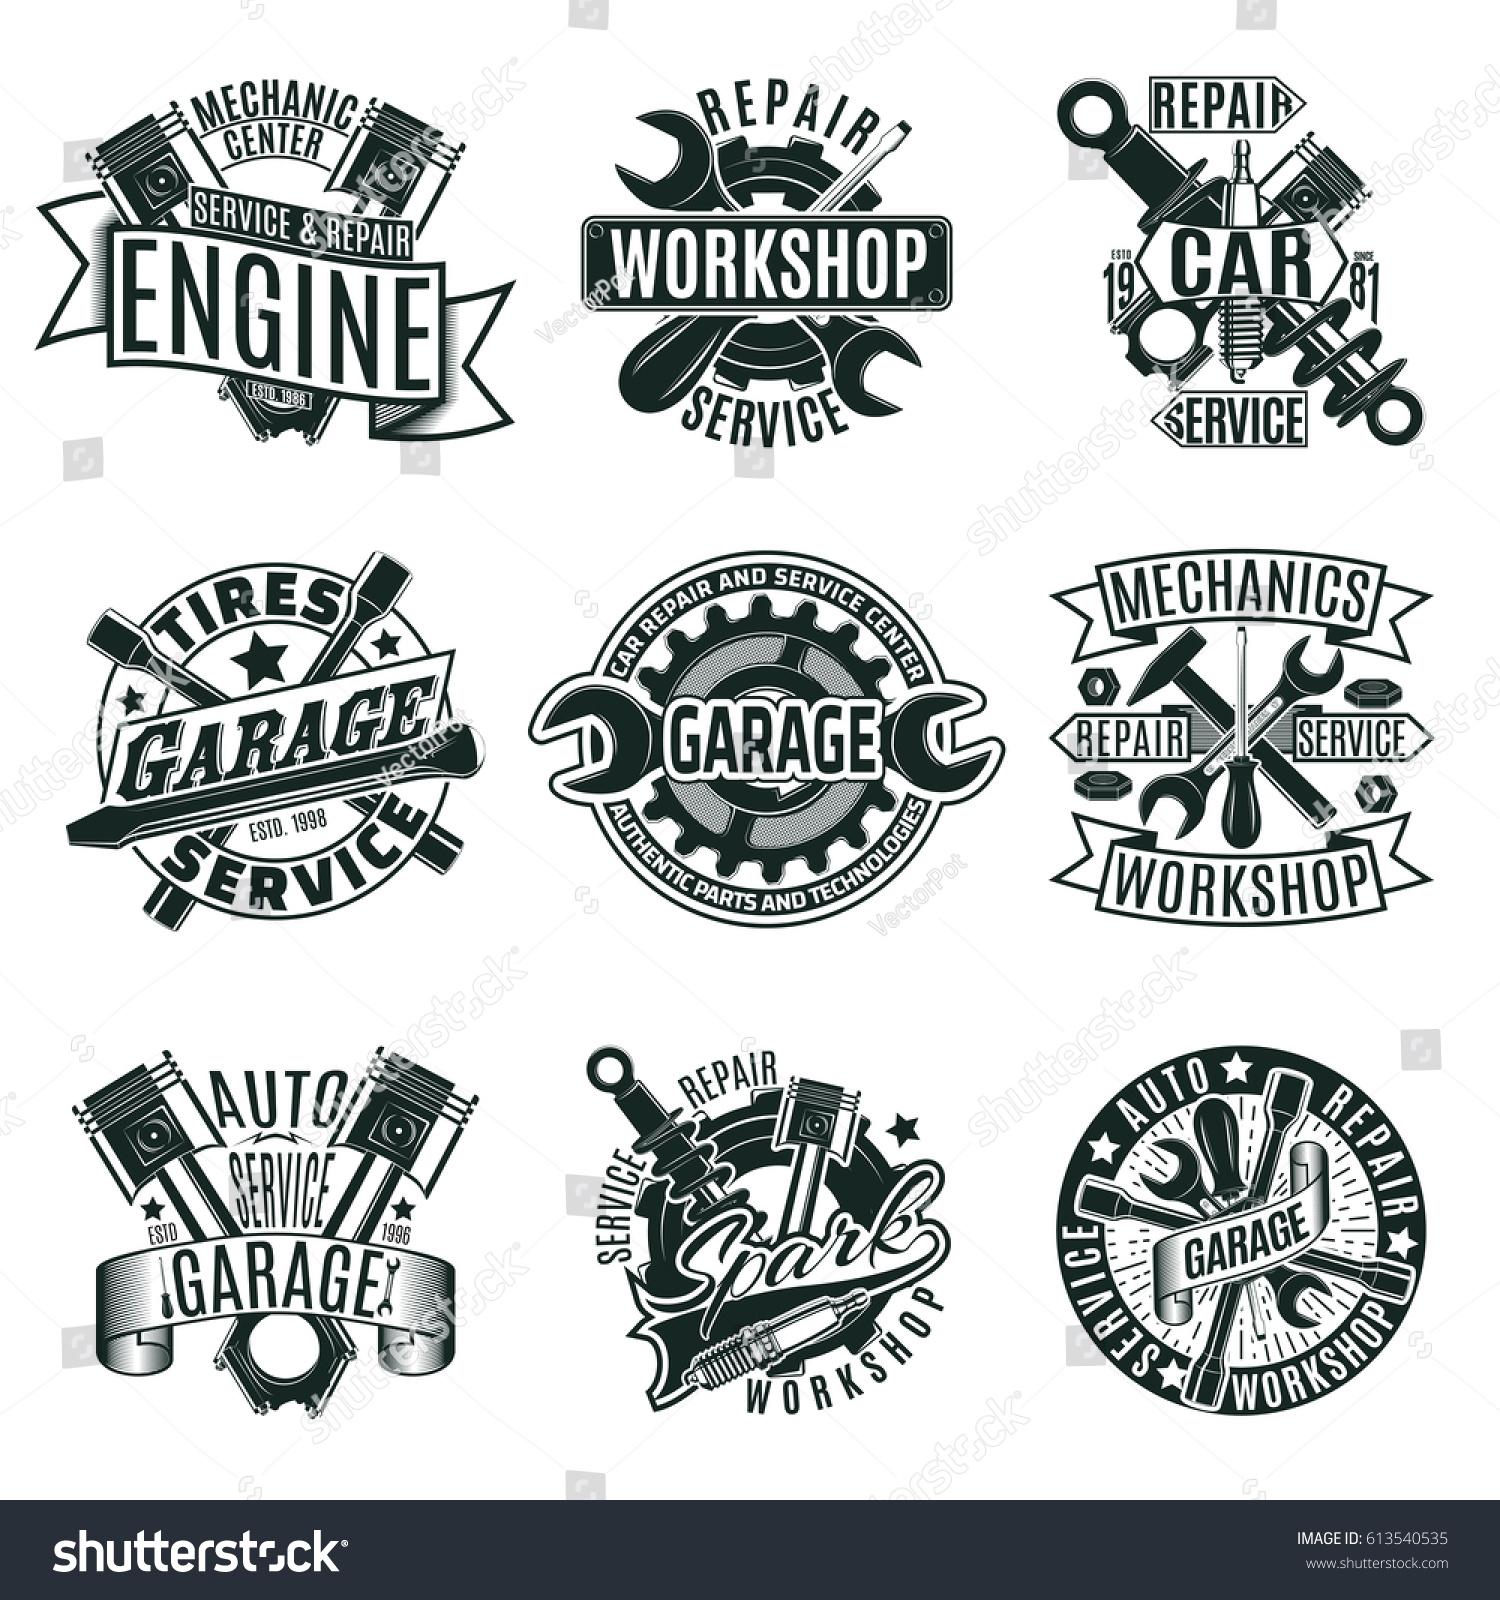 Monochrome Car Repair Service Logos Set Stock Vector